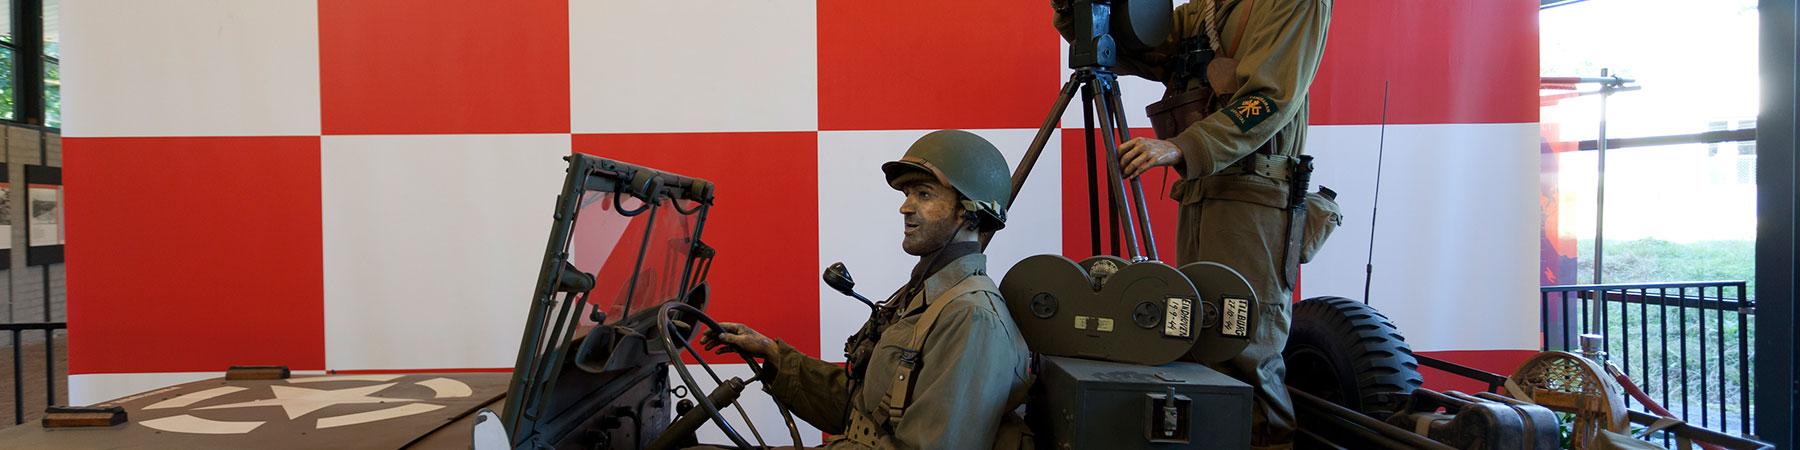 oorlogsmuseum-overloon9